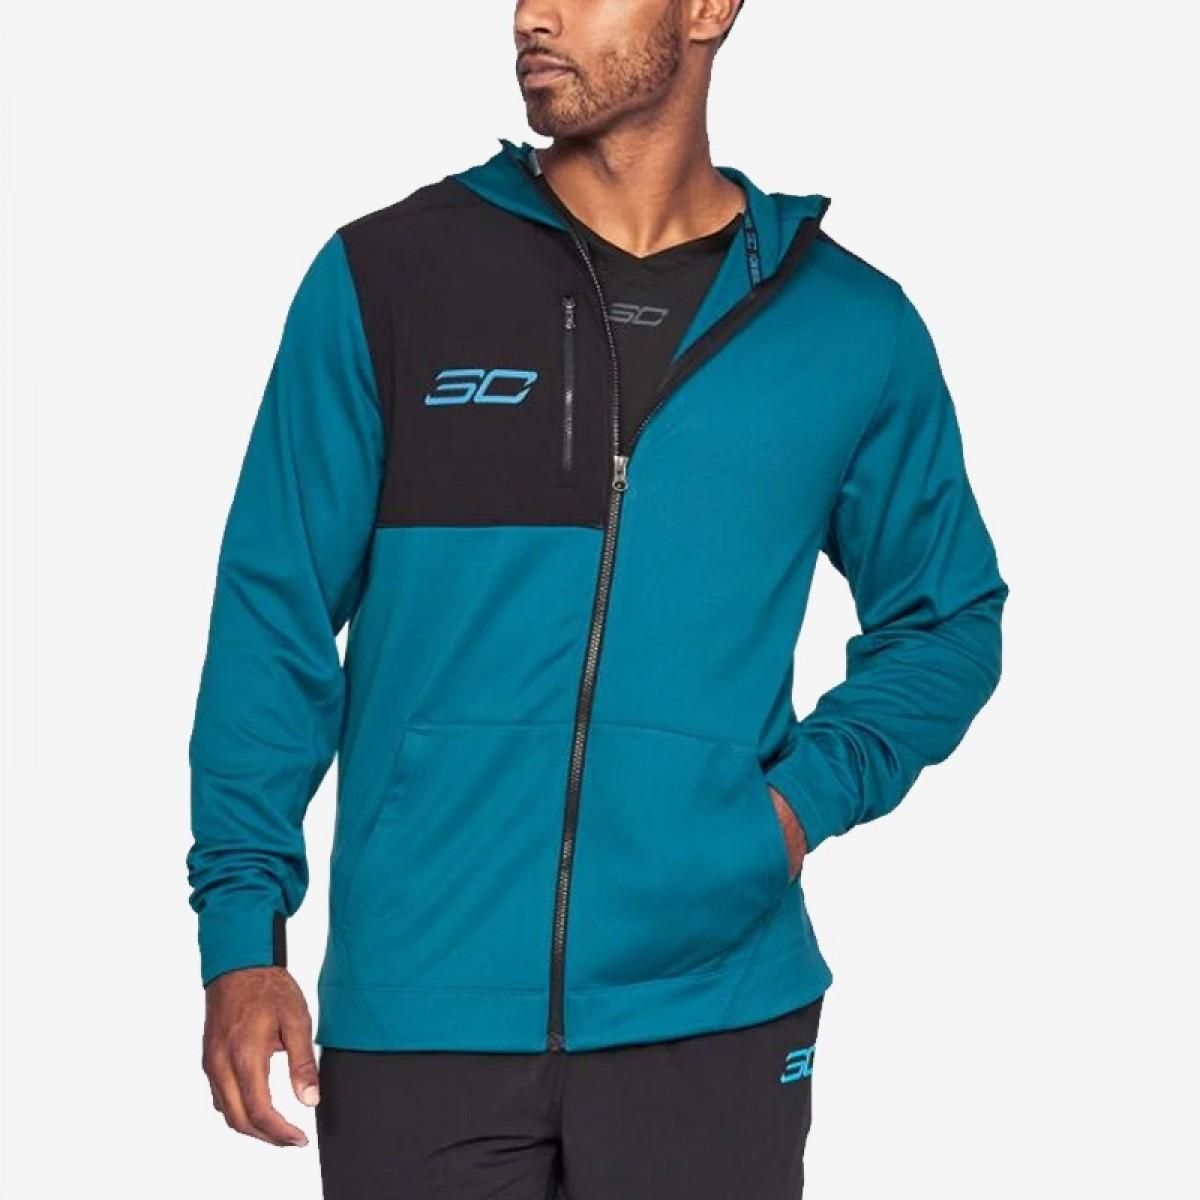 UA SC30 Warm Up Jacket 'Blue'